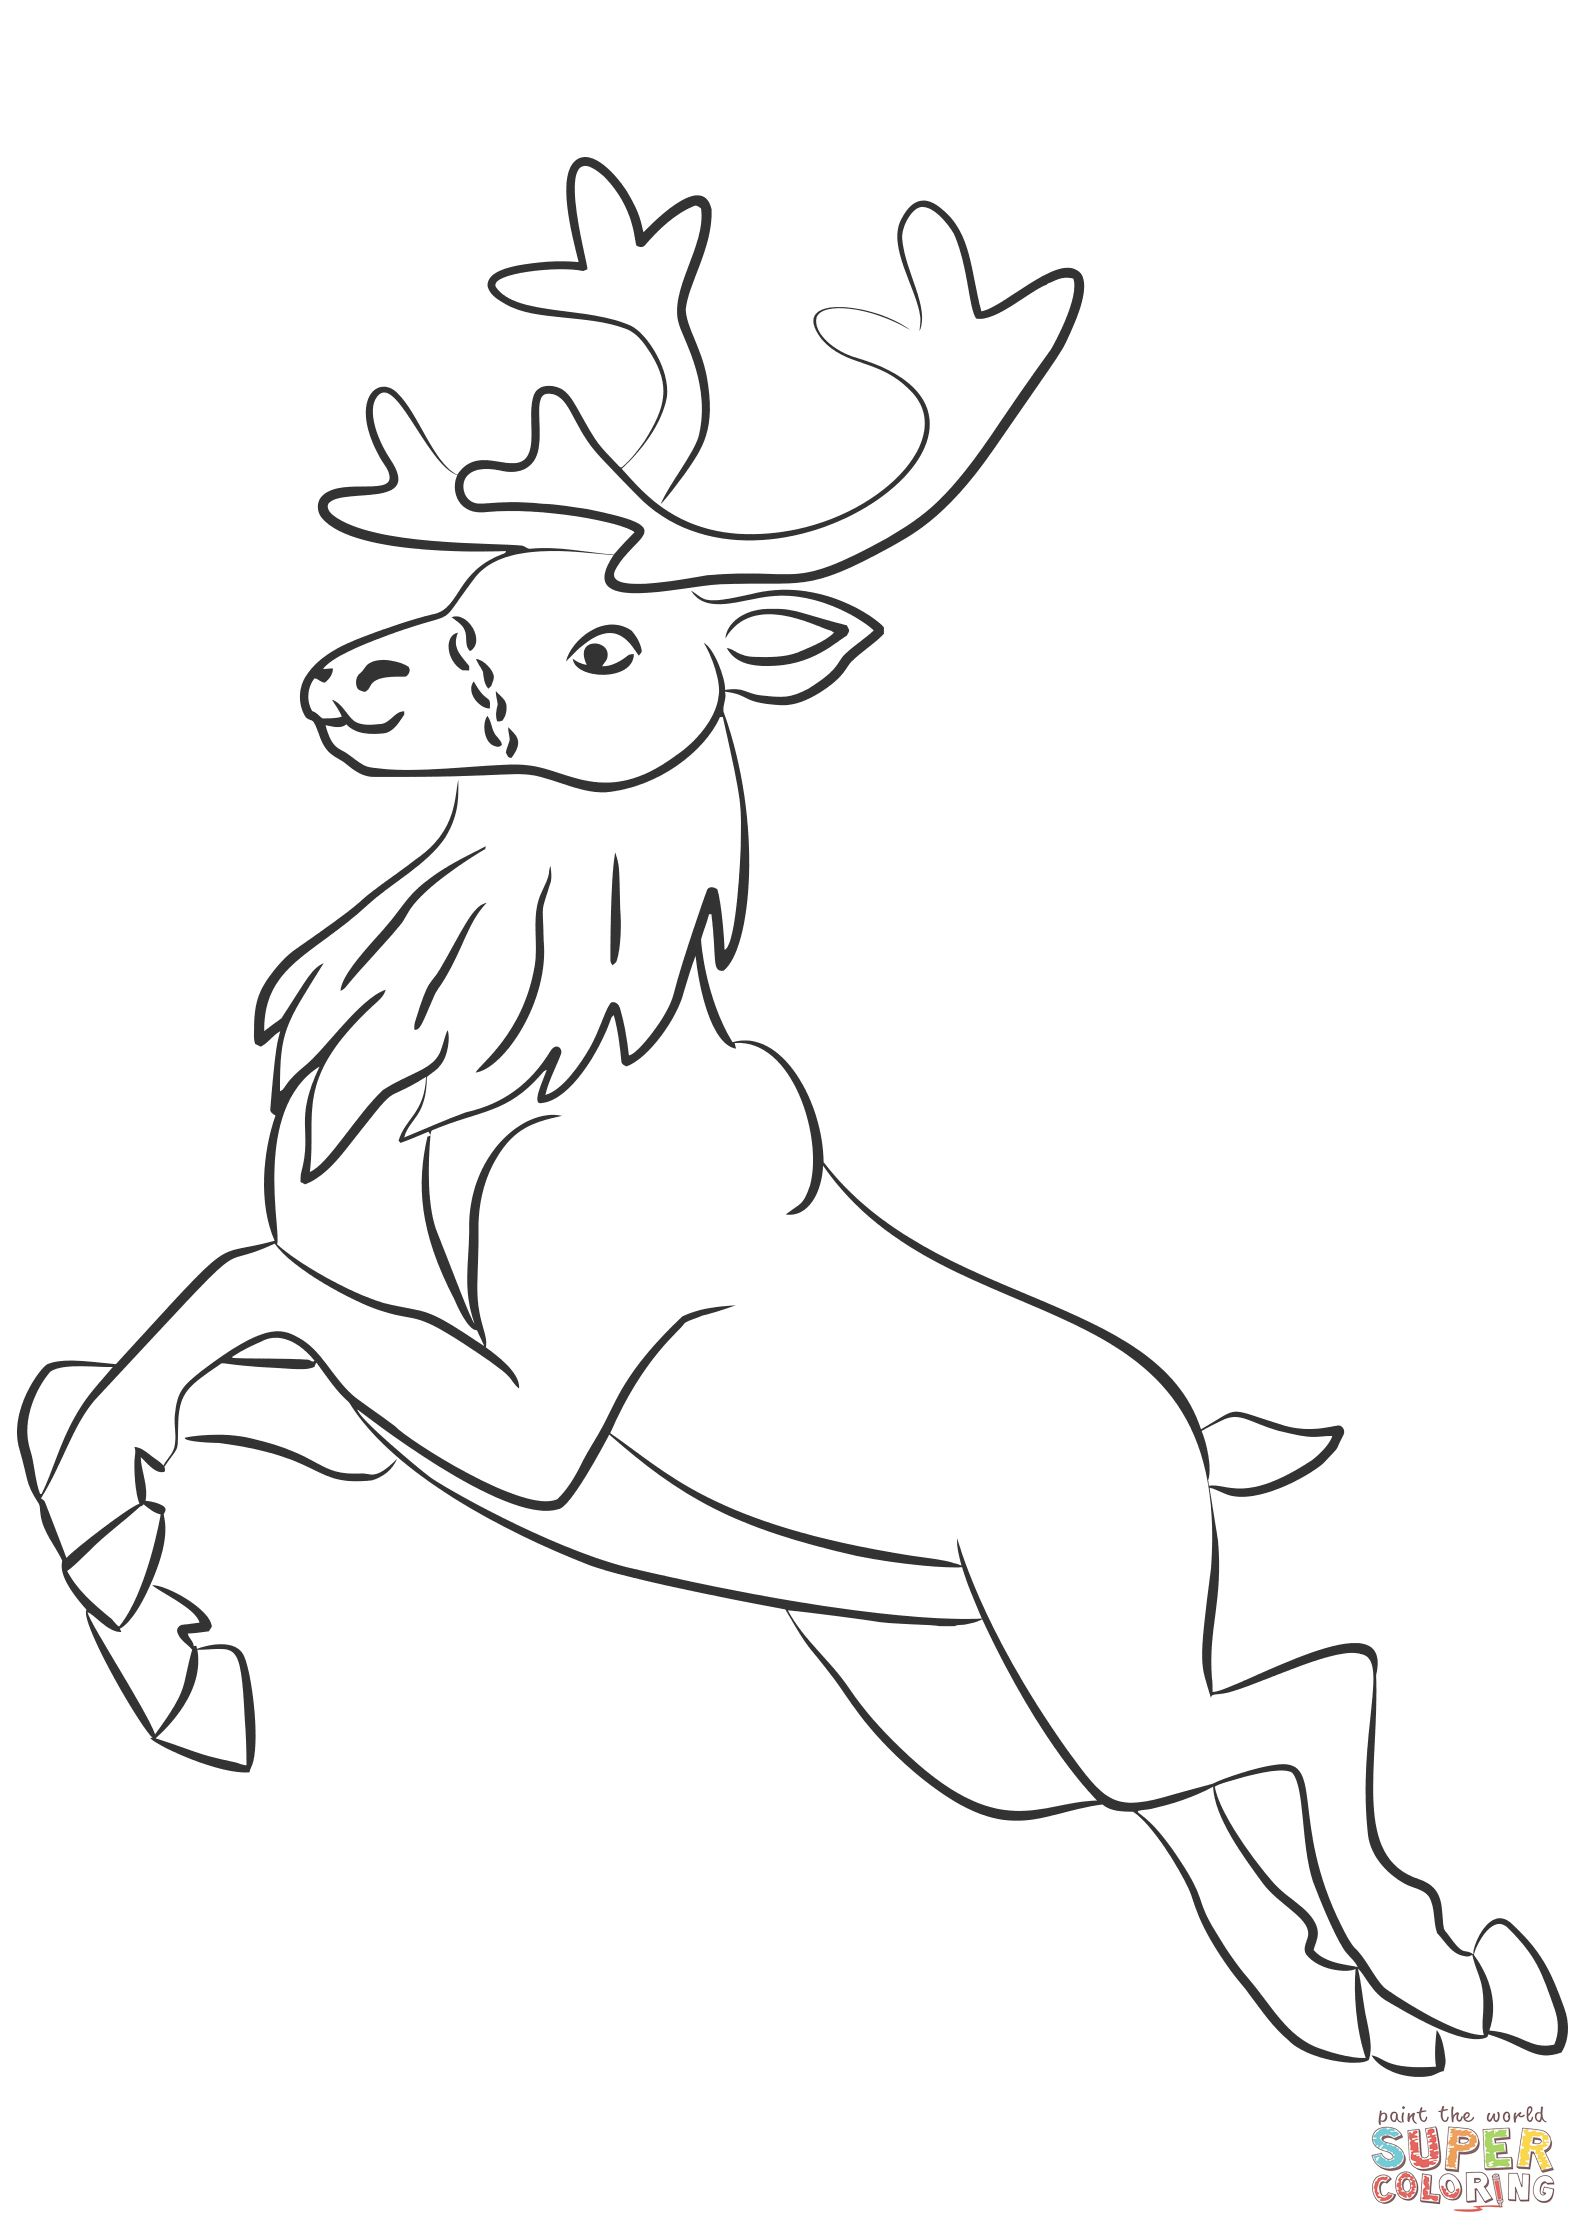 How To Draw Santa Reindeer 8 How To Draw A Christmas Deer Reindeer Drawings Inspiration Reindeer Drawing Deer Coloring Pages Rudolph Coloring Pages